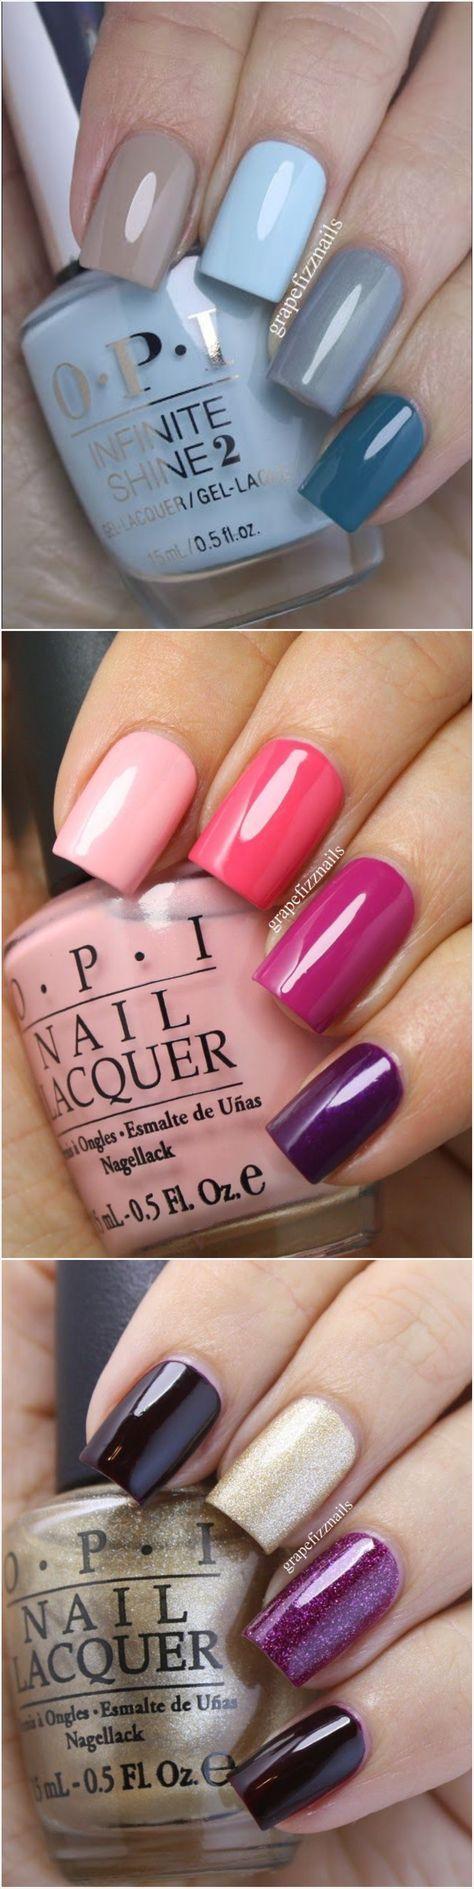 OPI nail swatches @grapefizznails